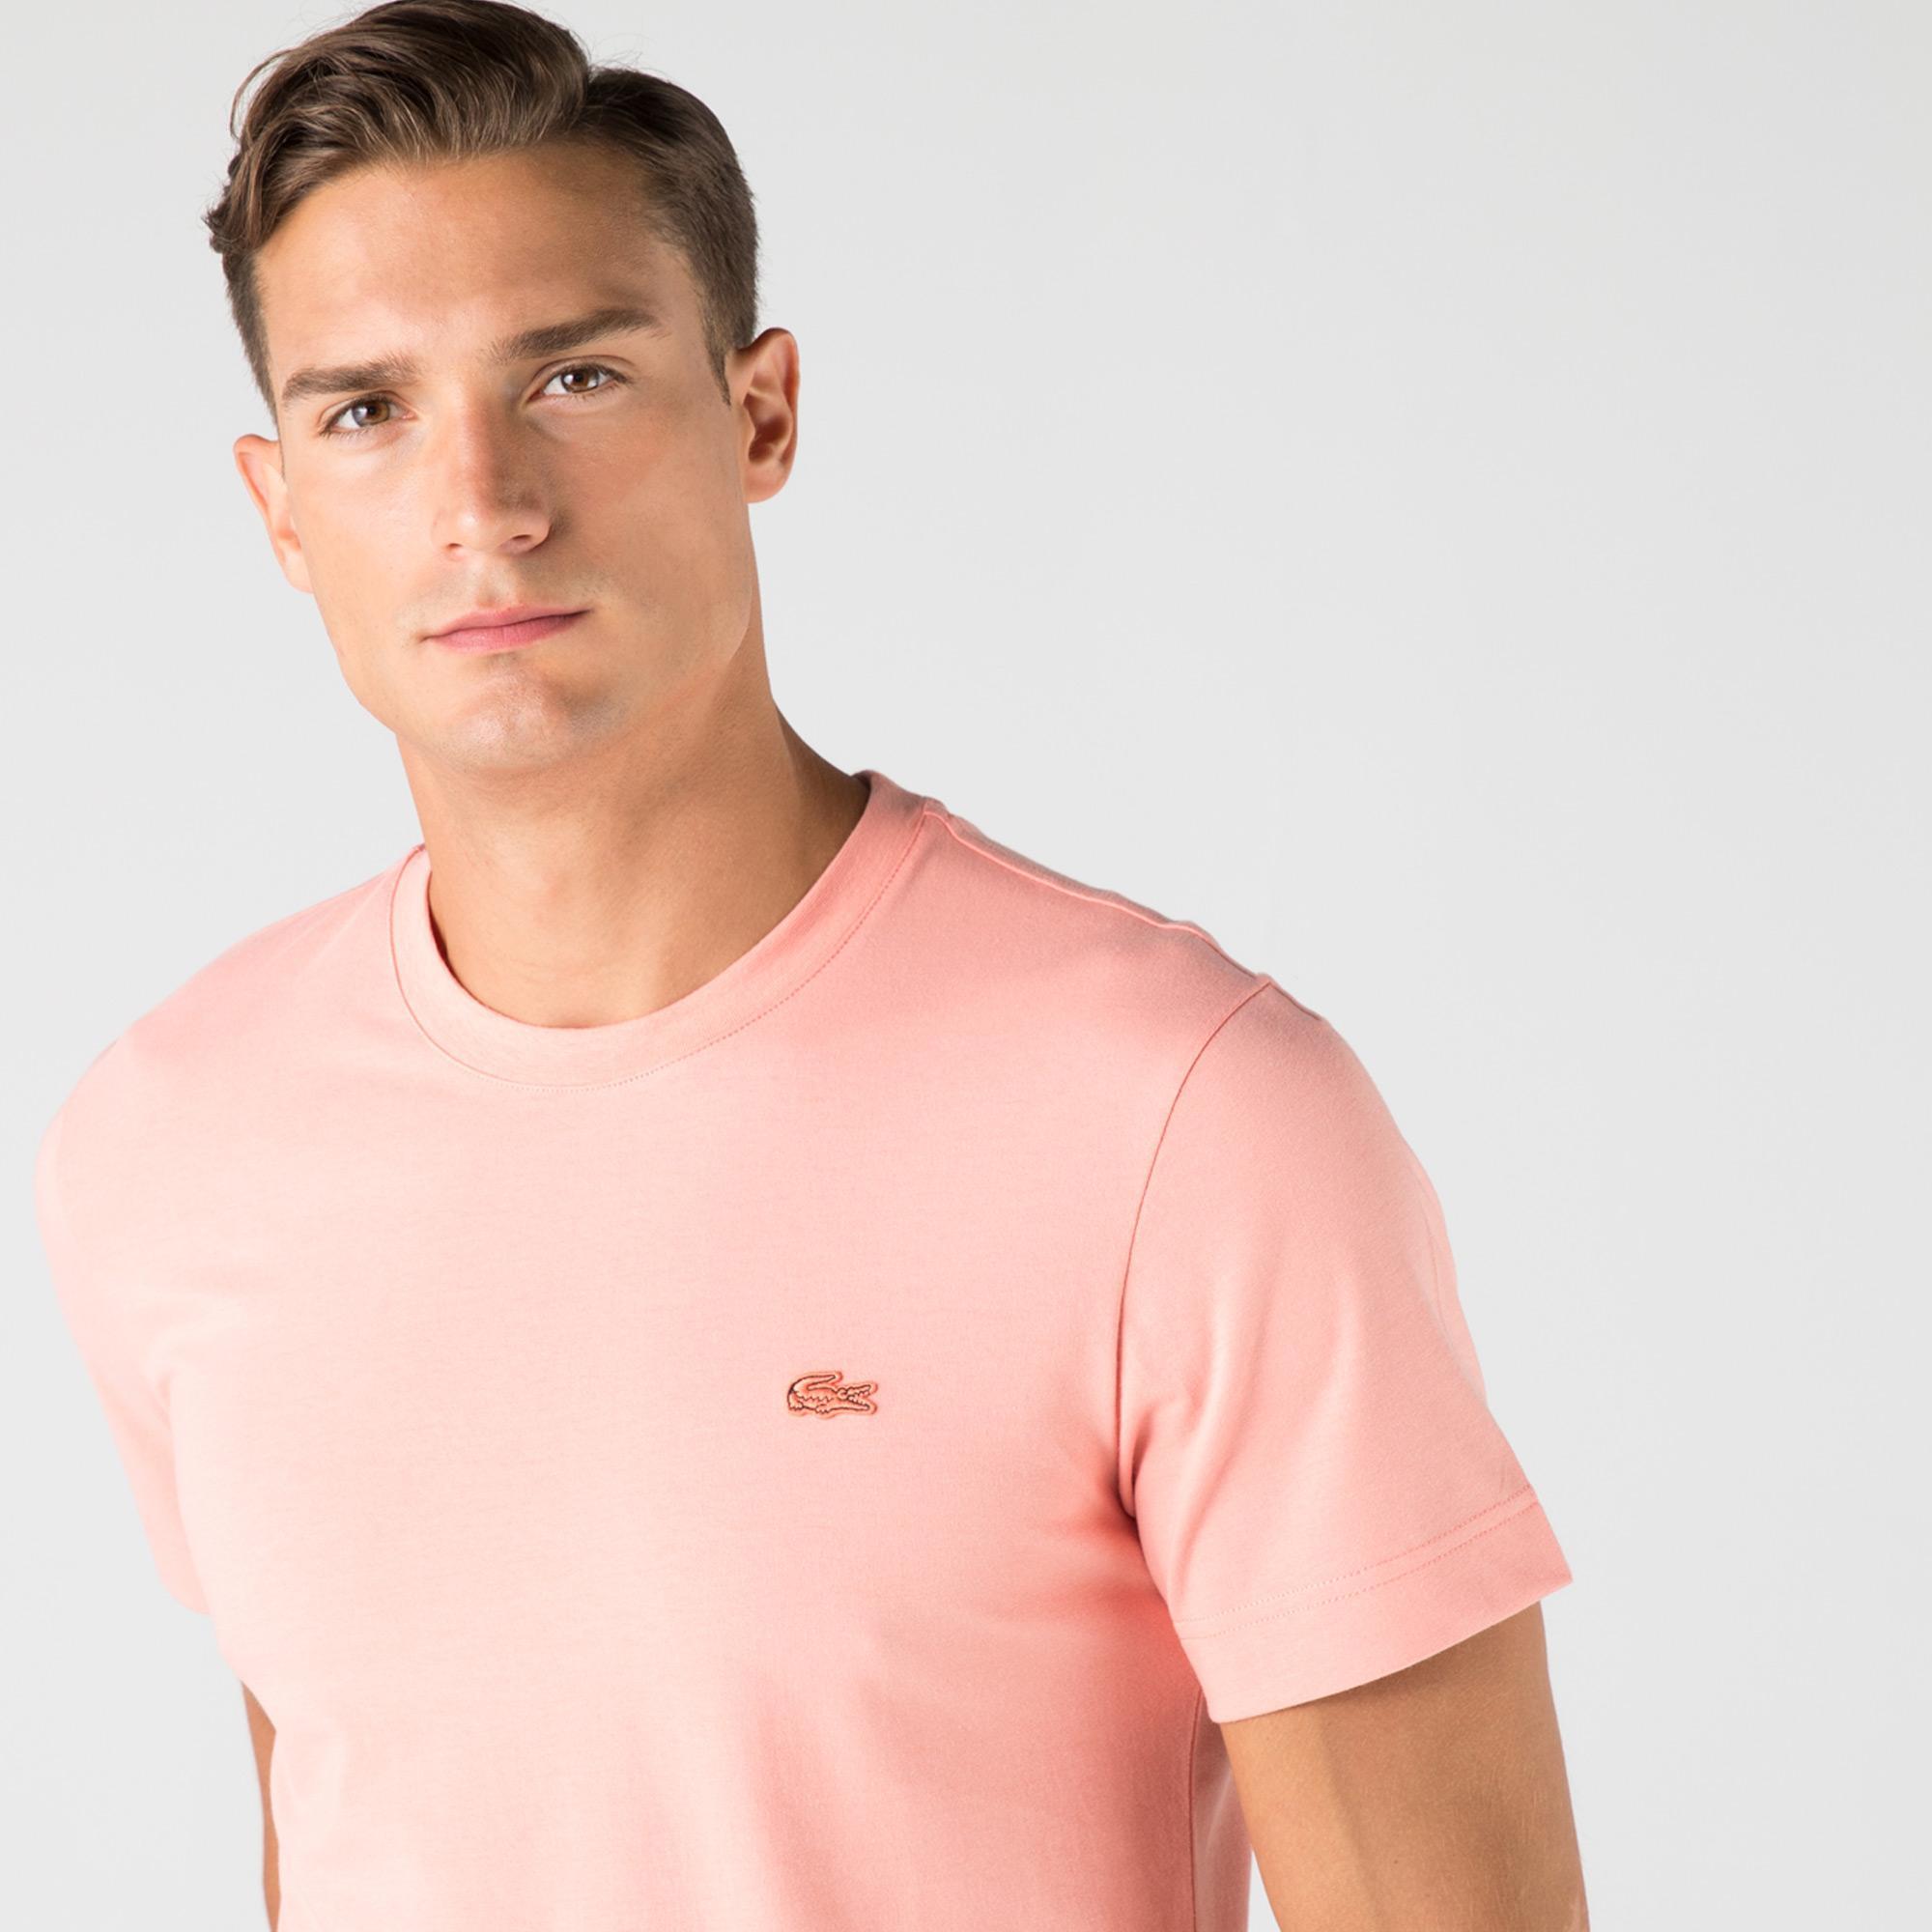 Lacoste Erkek Bisiklet Yaka Açık Pembe T-Shirt